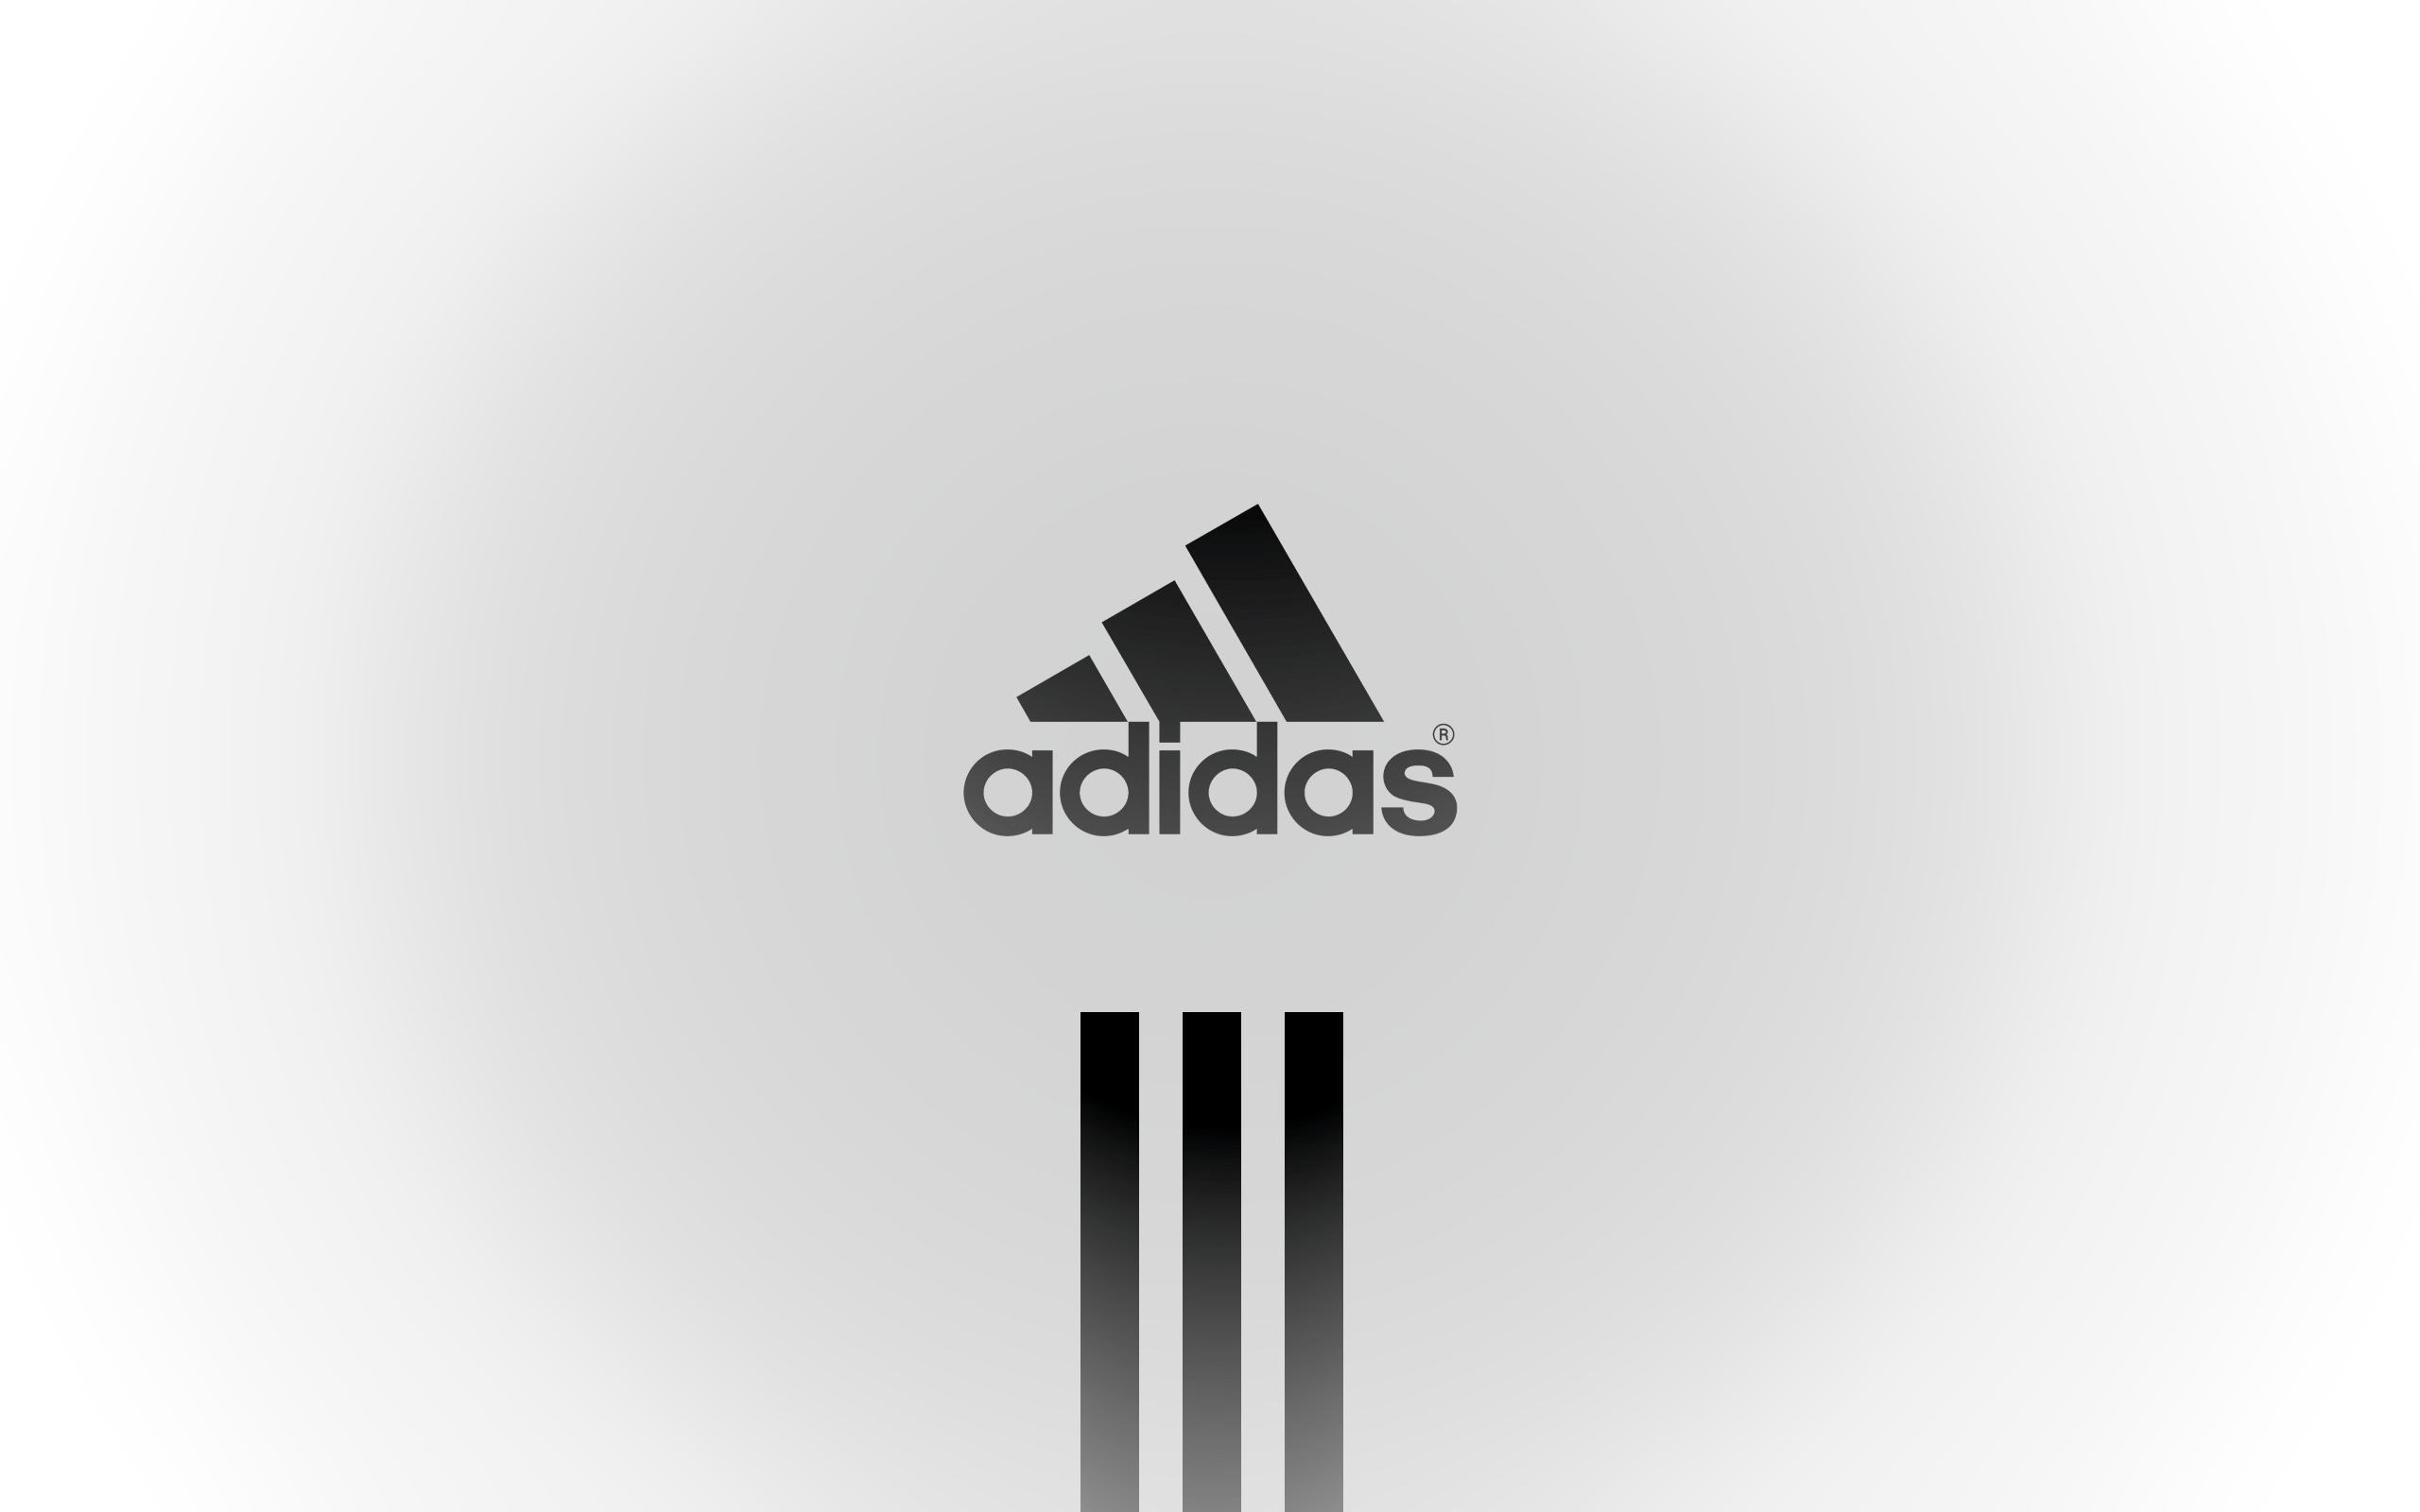 Adidas Logo White Png - Adidas, Transparent background PNG HD thumbnail